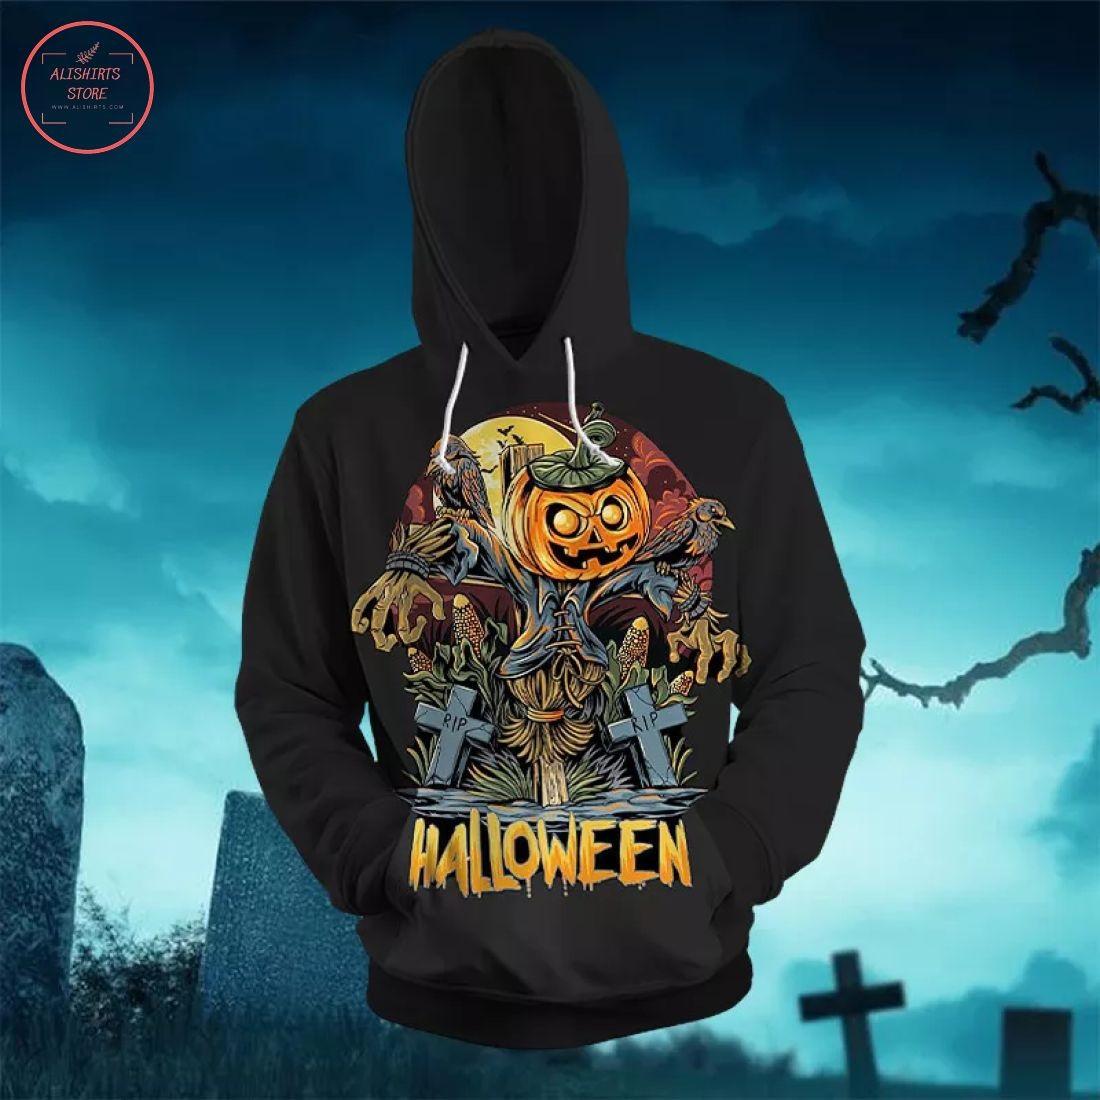 Halloween Scarecrow And Pumpkin Hoodie